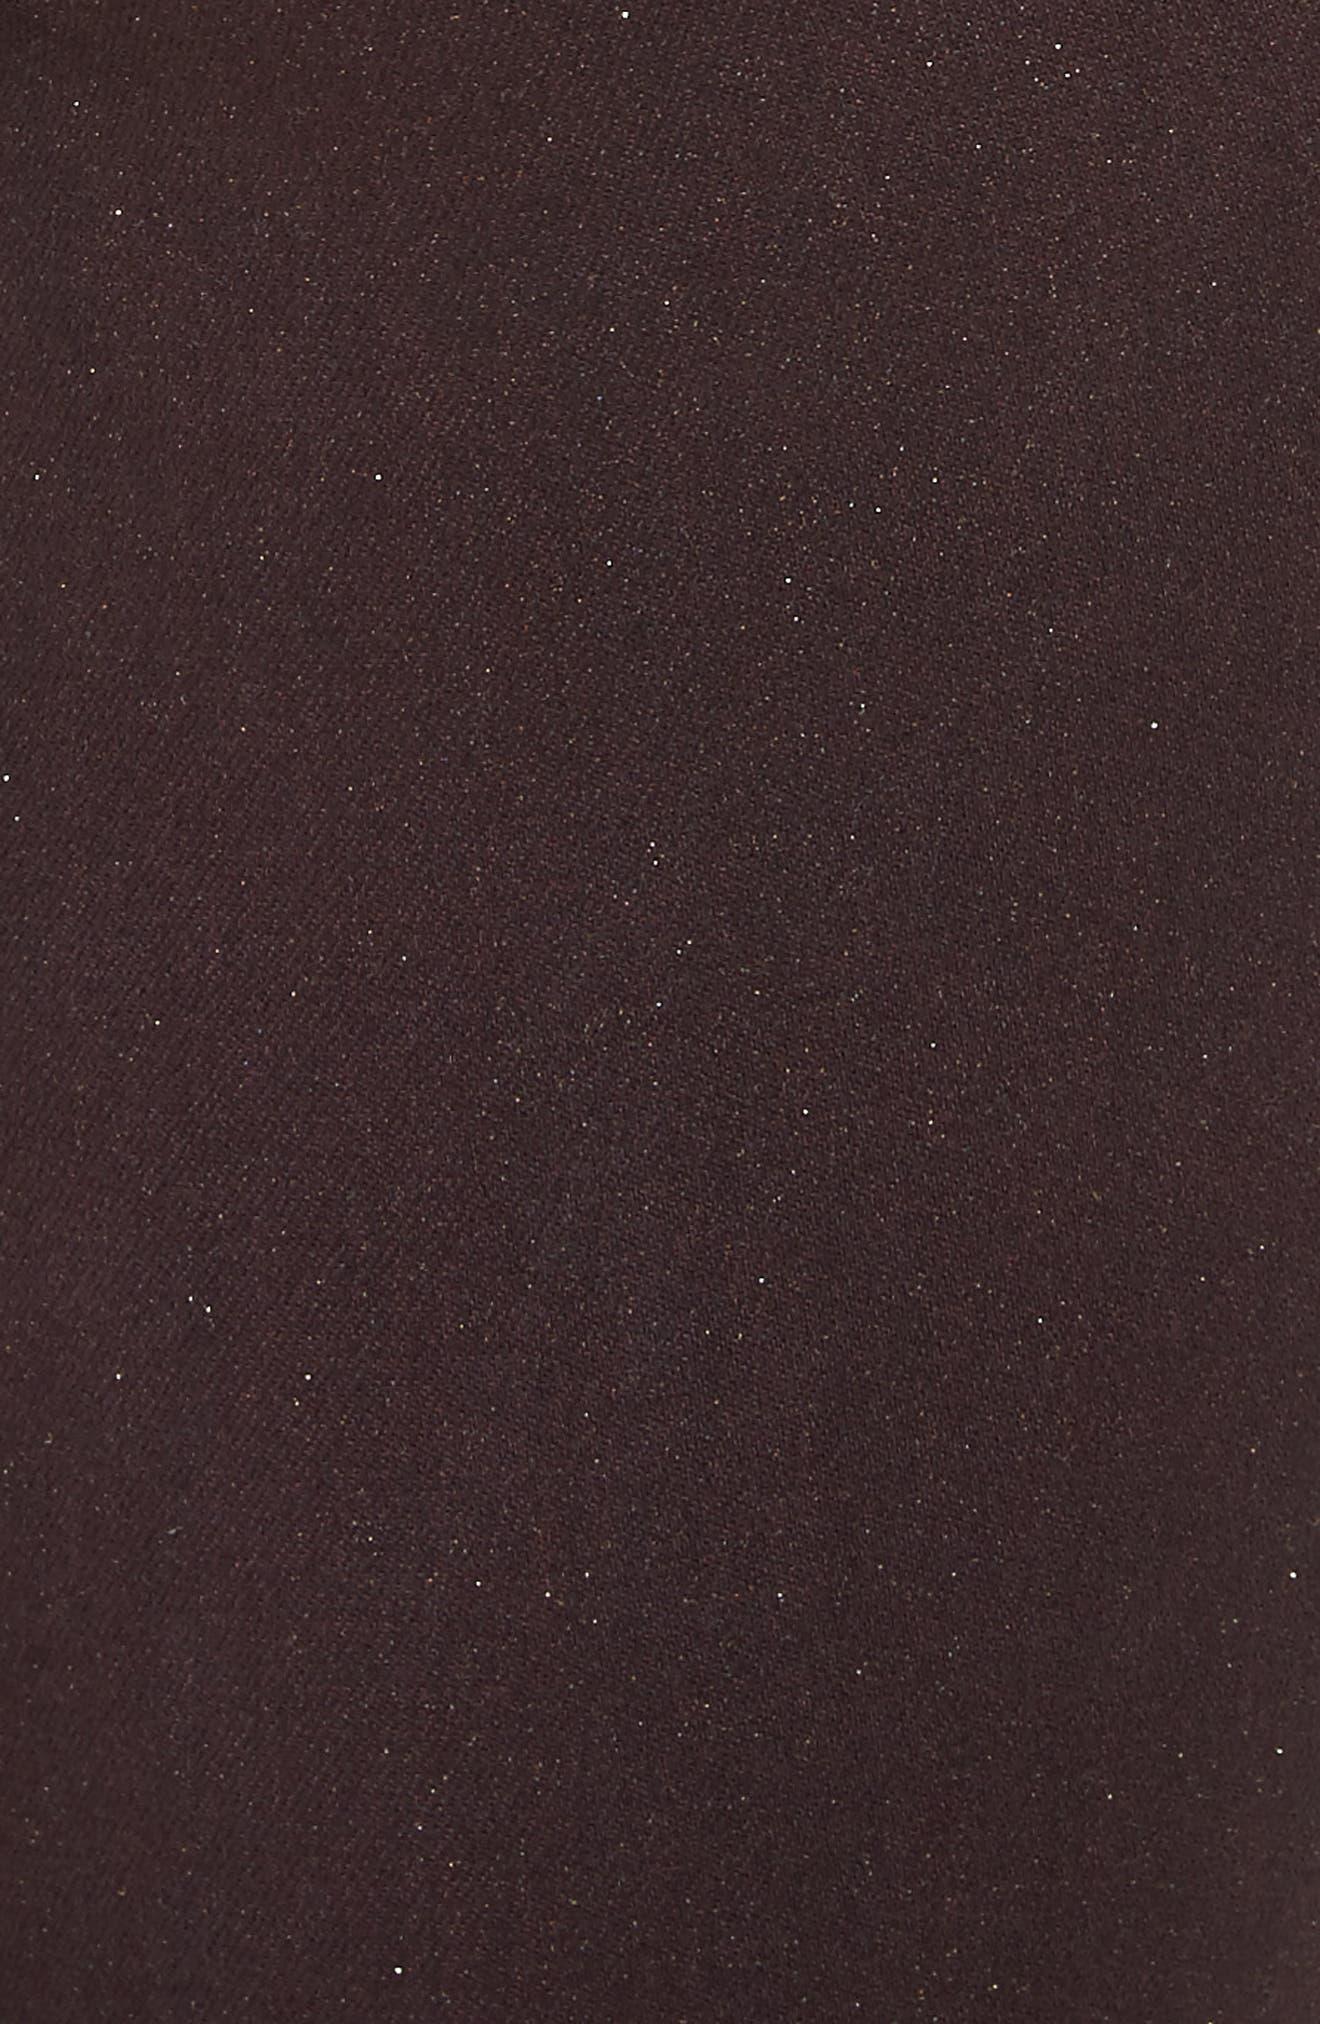 Margot High Waist Glitter Coated Jeans,                             Alternate thumbnail 5, color,                             Bordeaux Glitter Coated